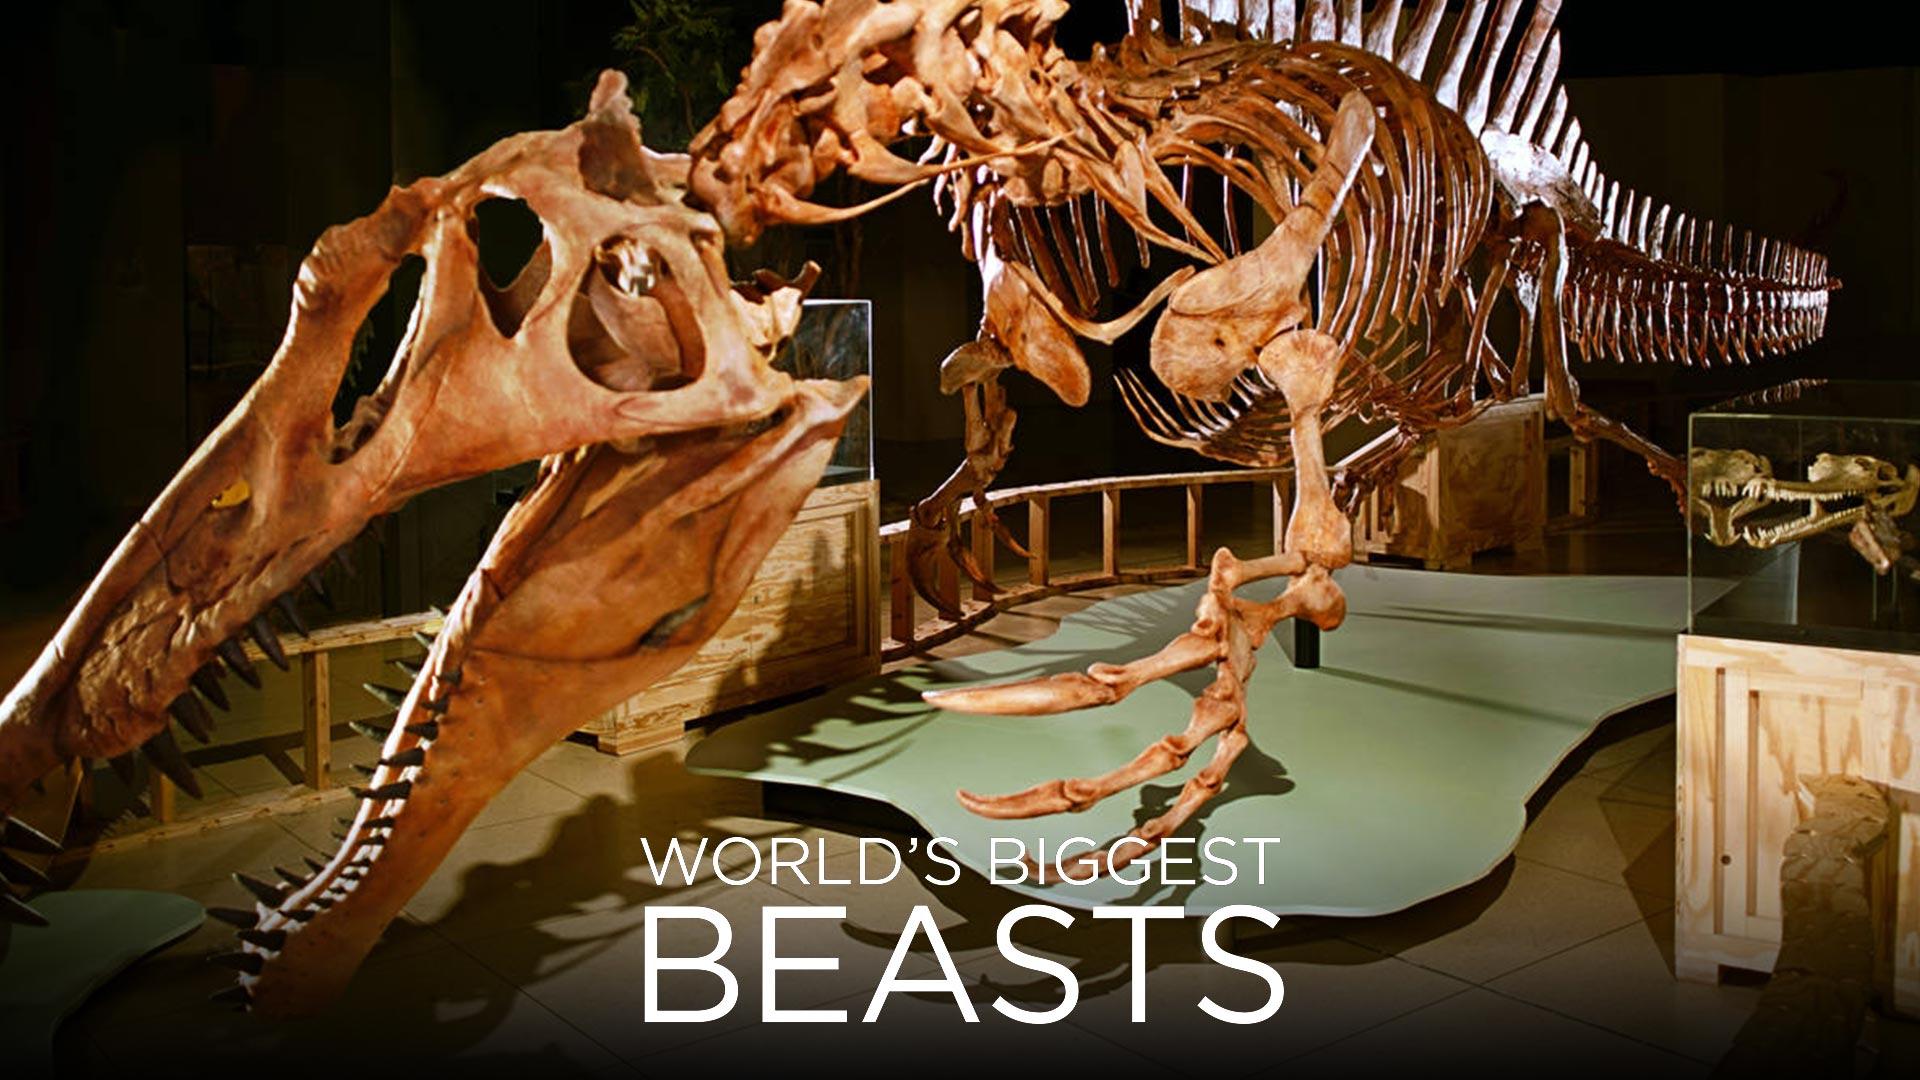 World's Biggest Beasts